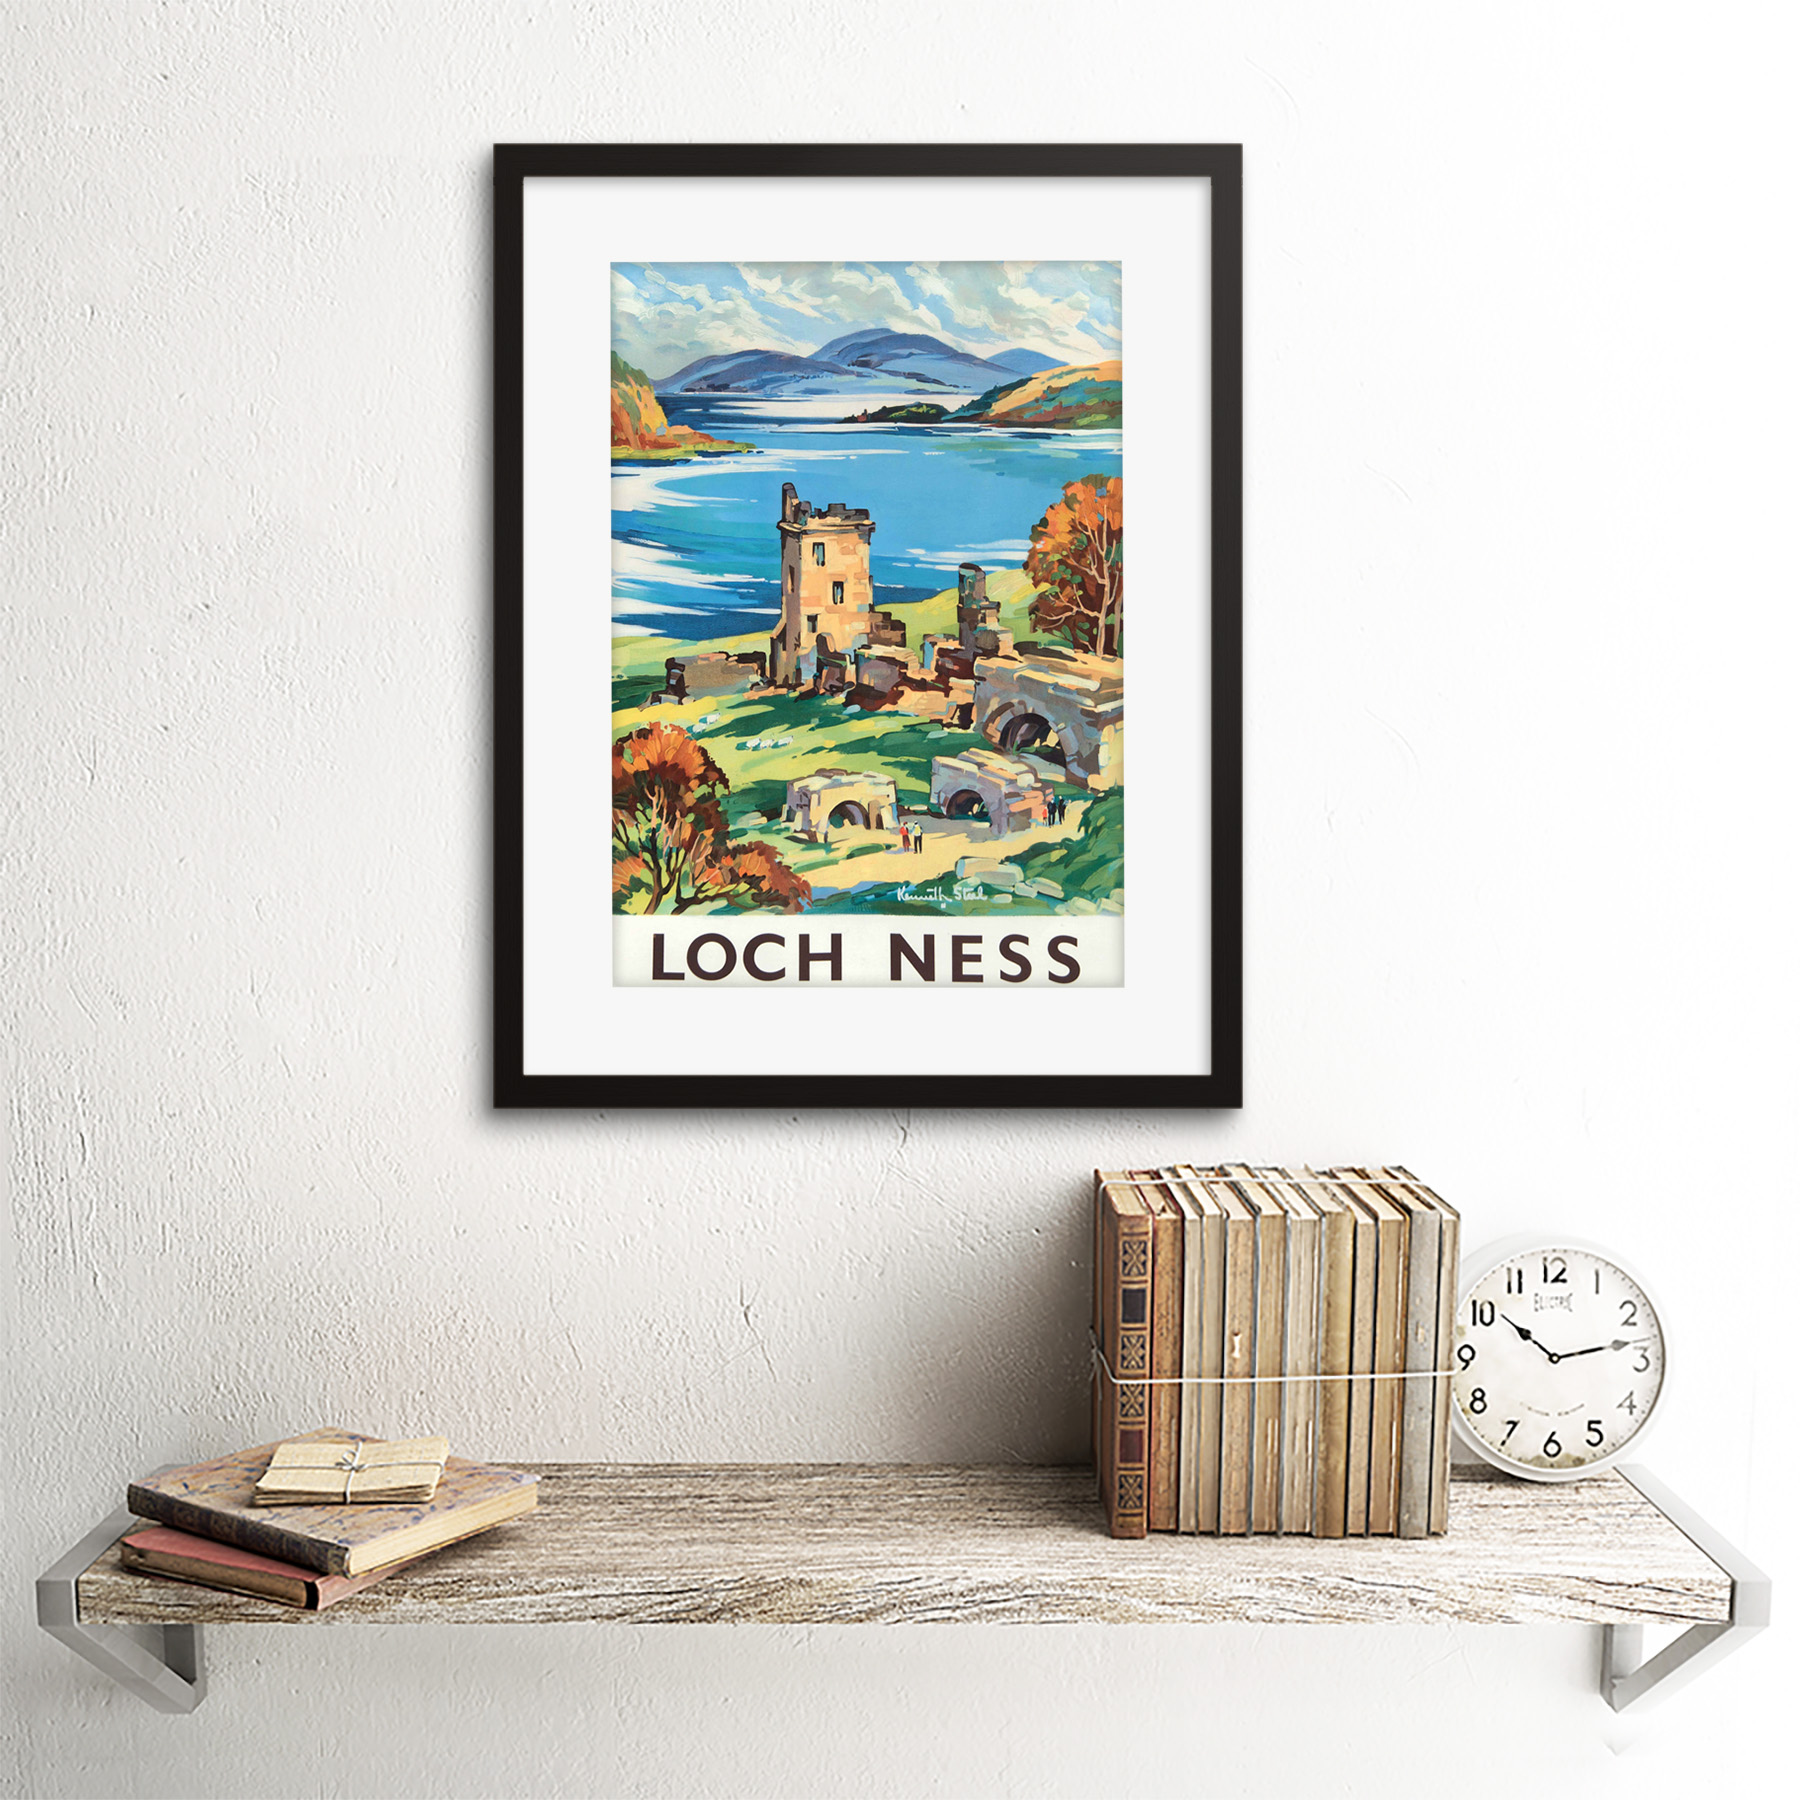 thumbnail 3 - Travel-Scotland-Castle-Loch-Ness-British-Railways-Framed-Art-Print-12x16-Inch